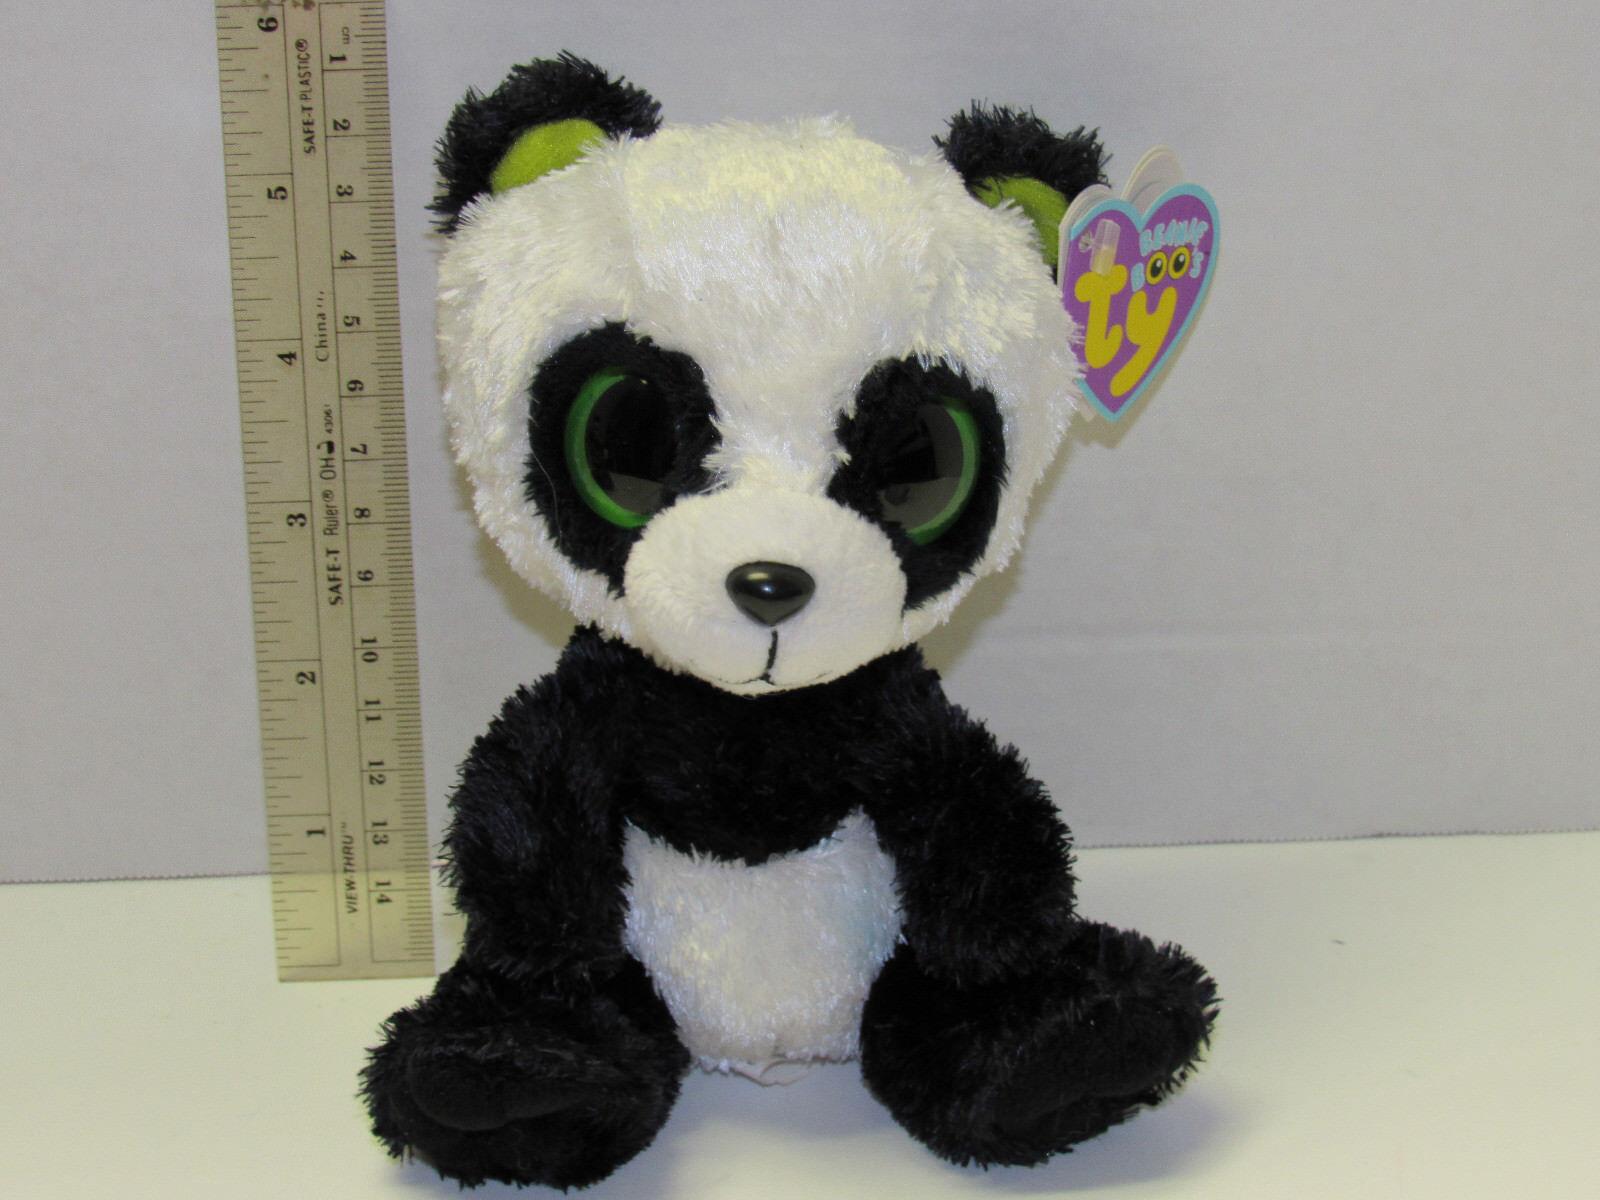 NWT AS IS RETIRED TY beanie Baby Boos Boos Boos Boo Bamboo Panda 6  NO Poem HTF 2013 5ad646